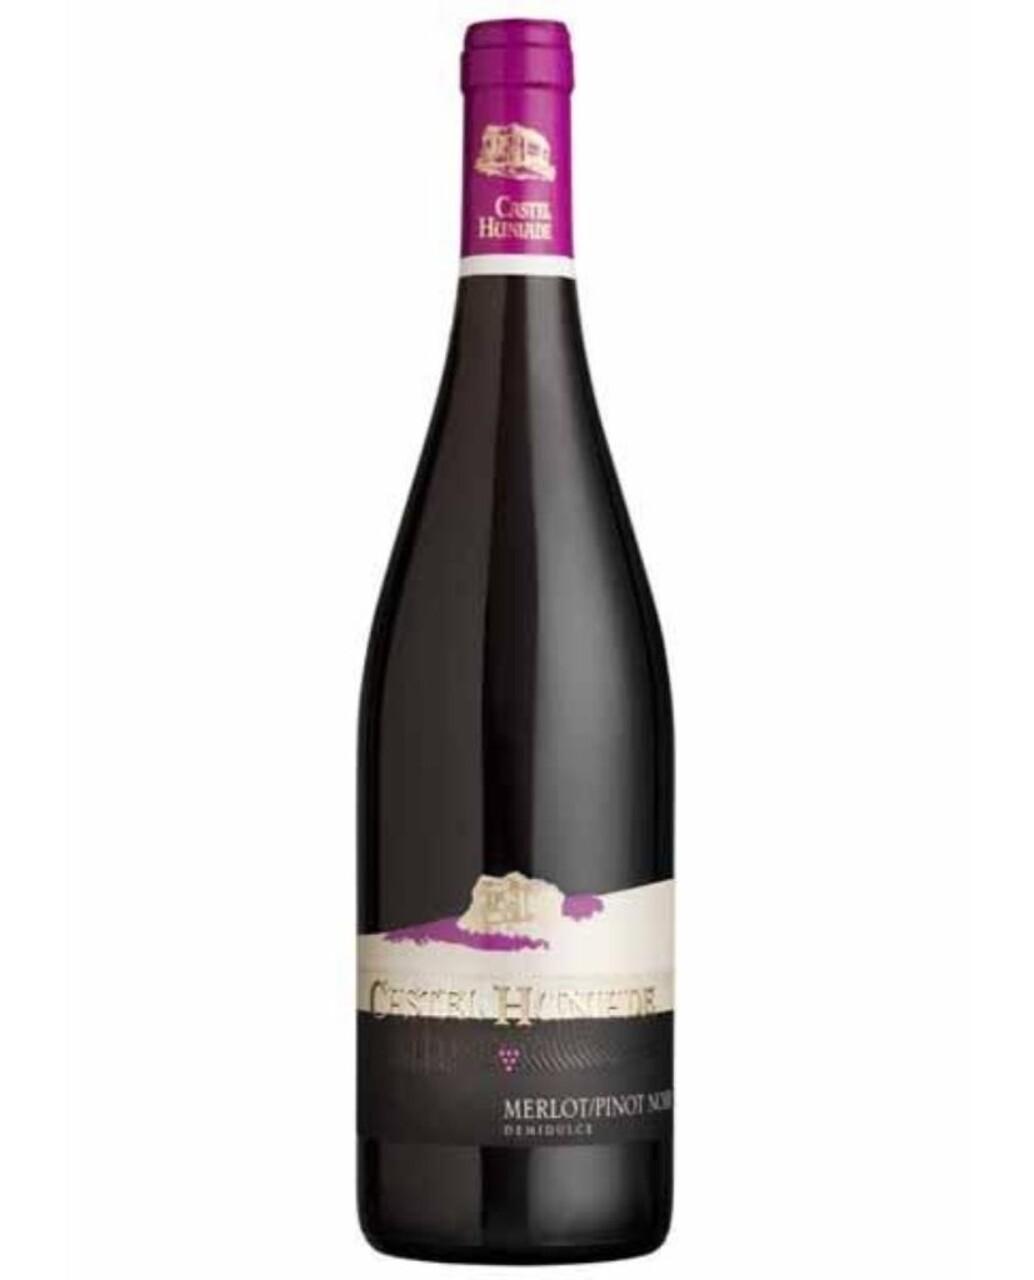 Recas Castel Huniade Merlot, Pinot Noir